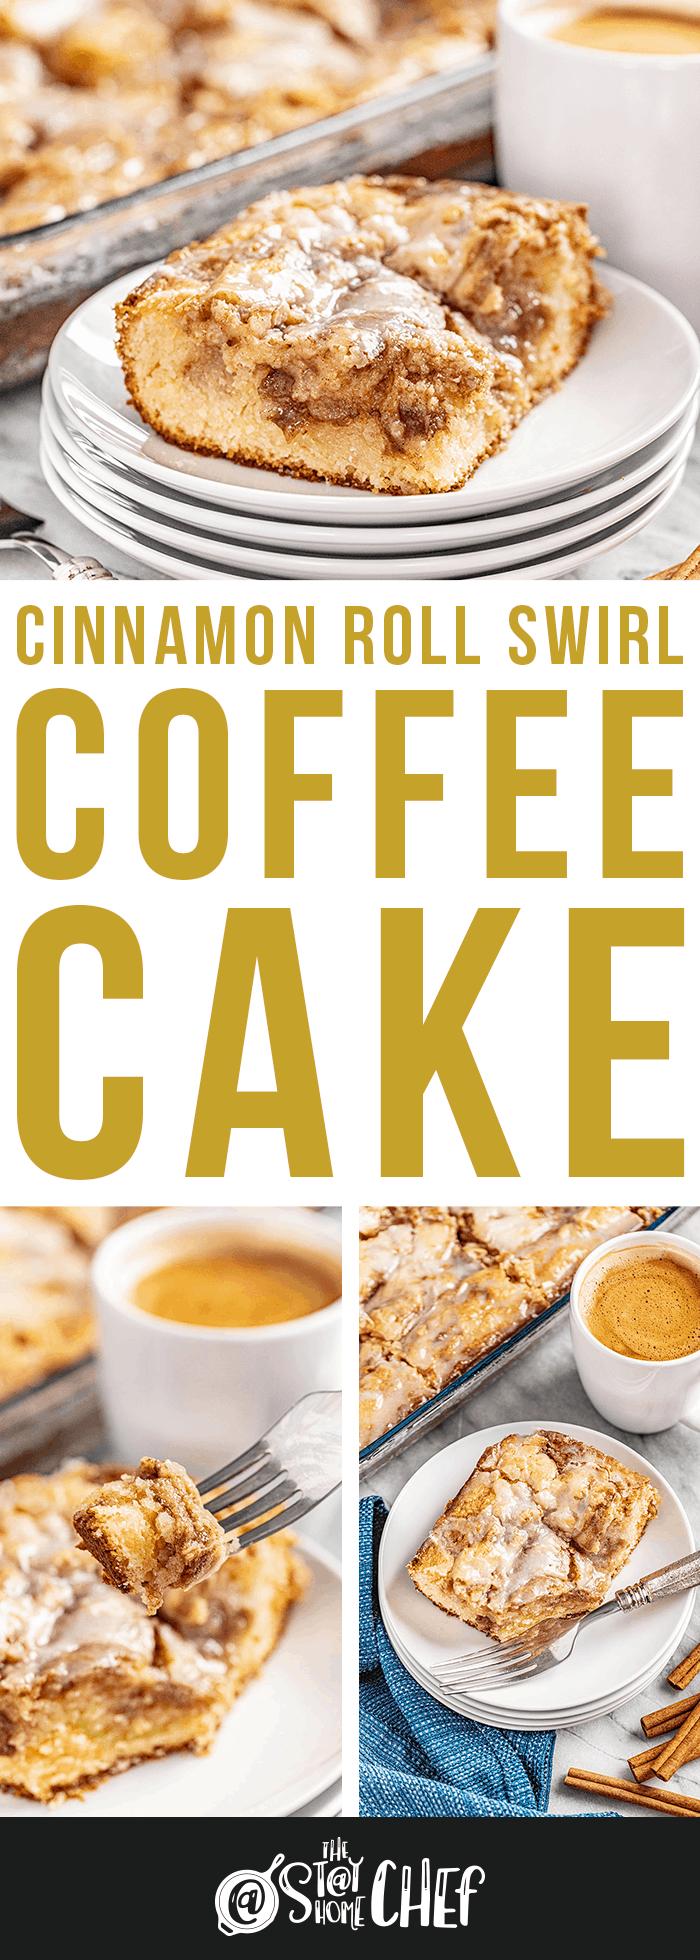 Cinnamon swirl coffee cake served on a plate.